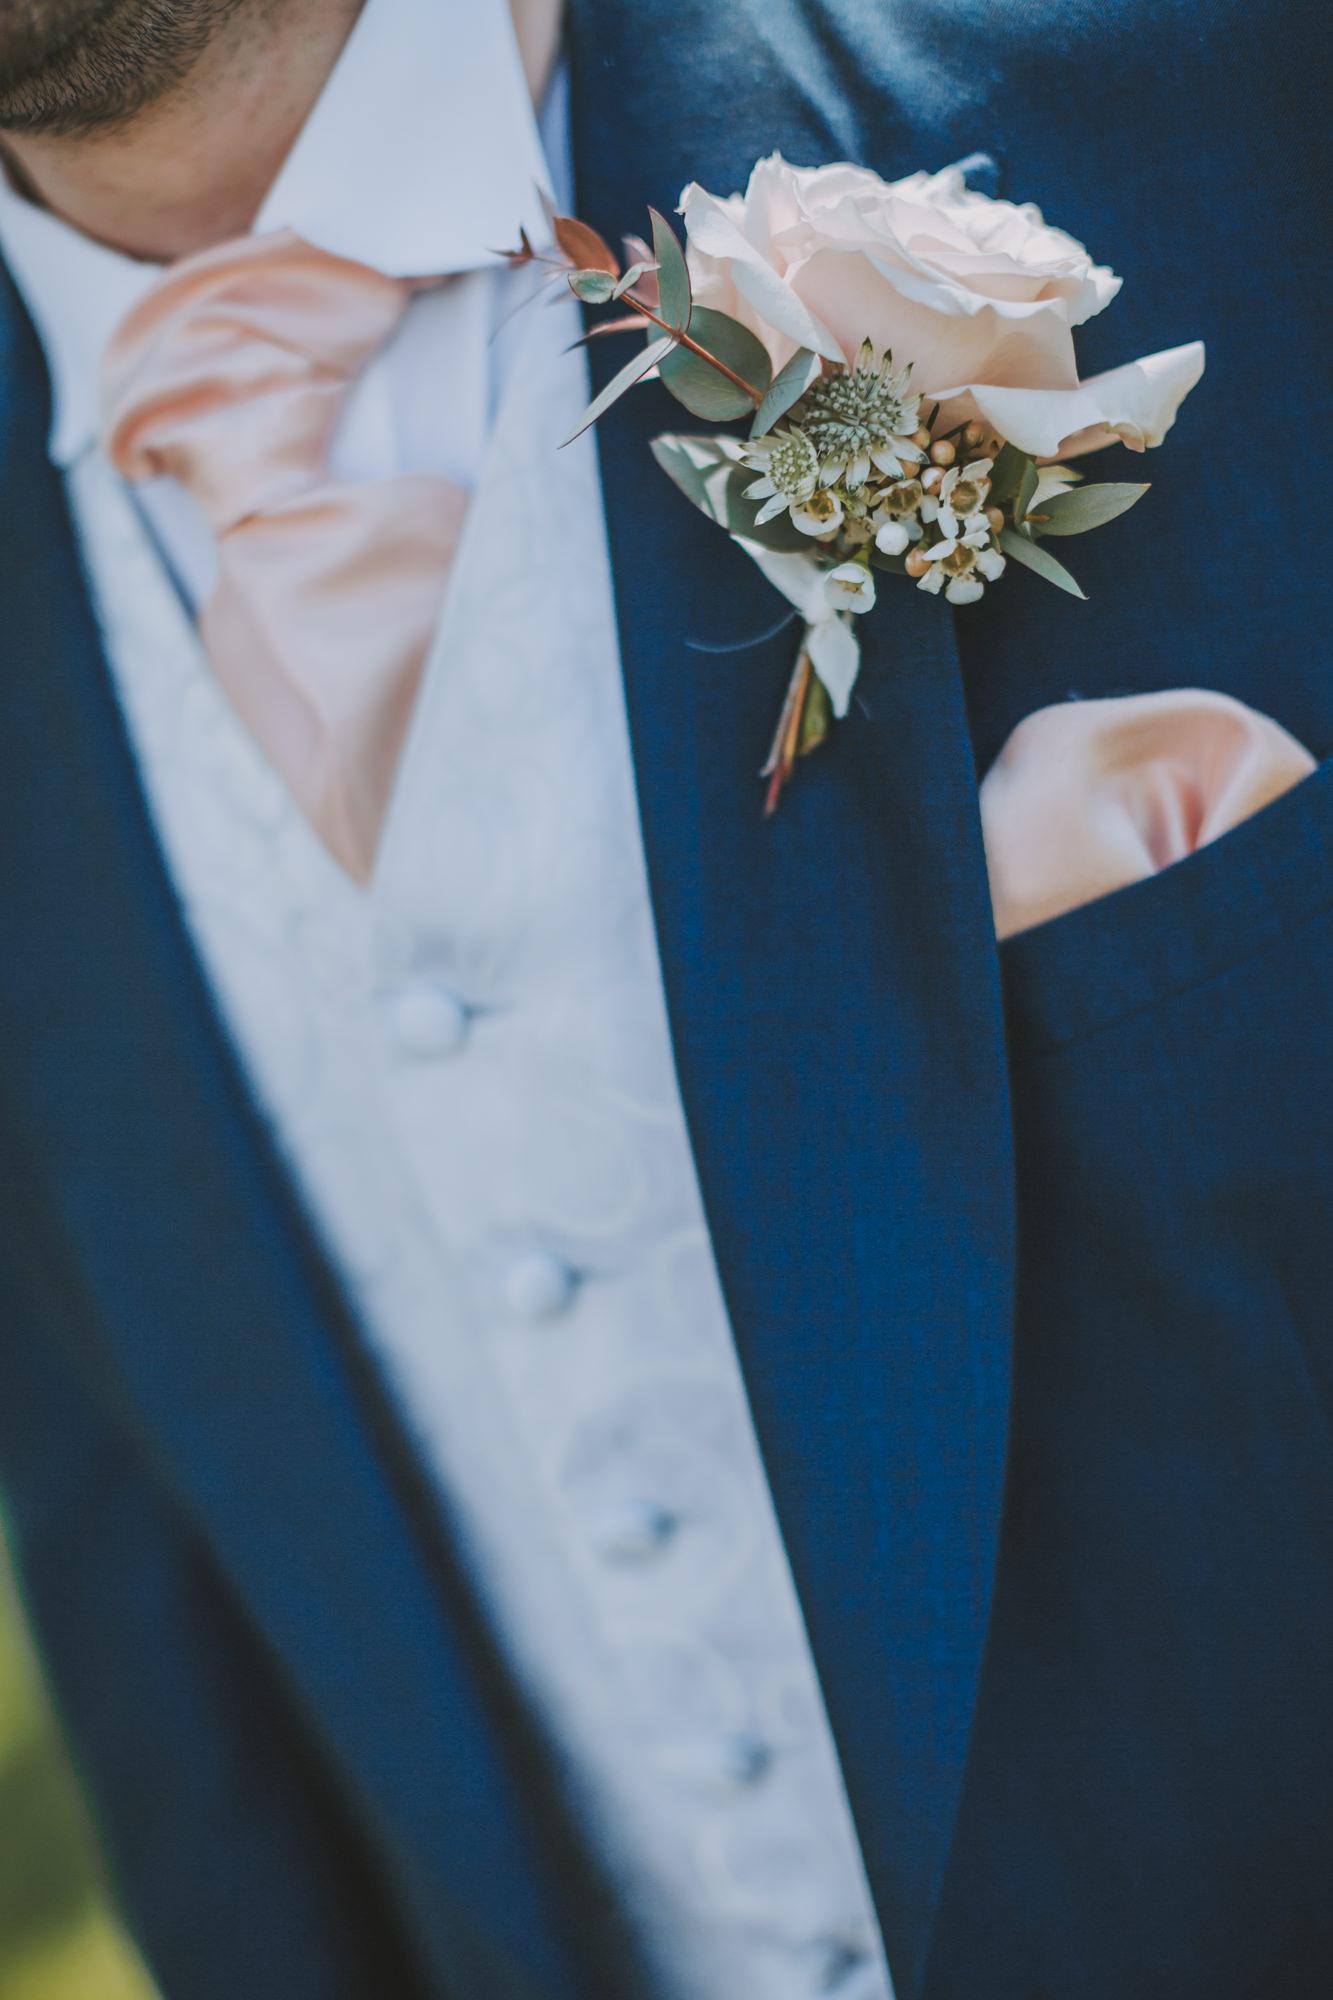 hellaby hall wedding photographers in rotherham, yorkshire-16.jpg